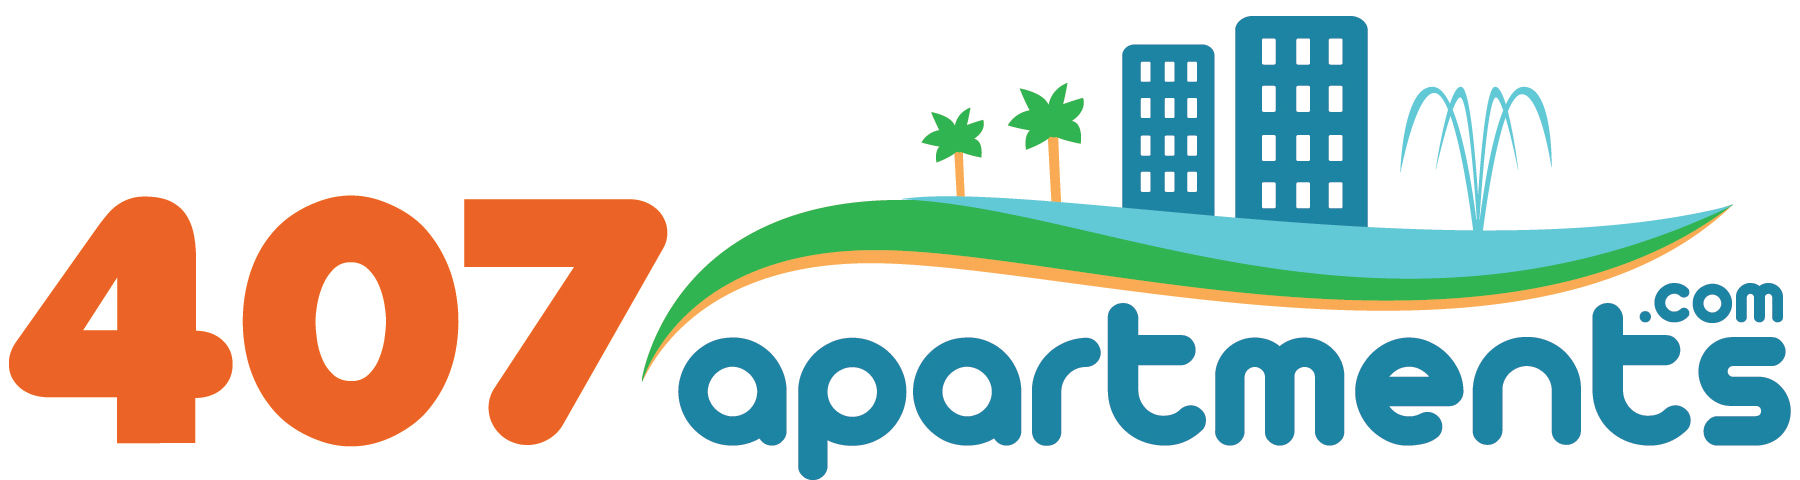 407apartments logo